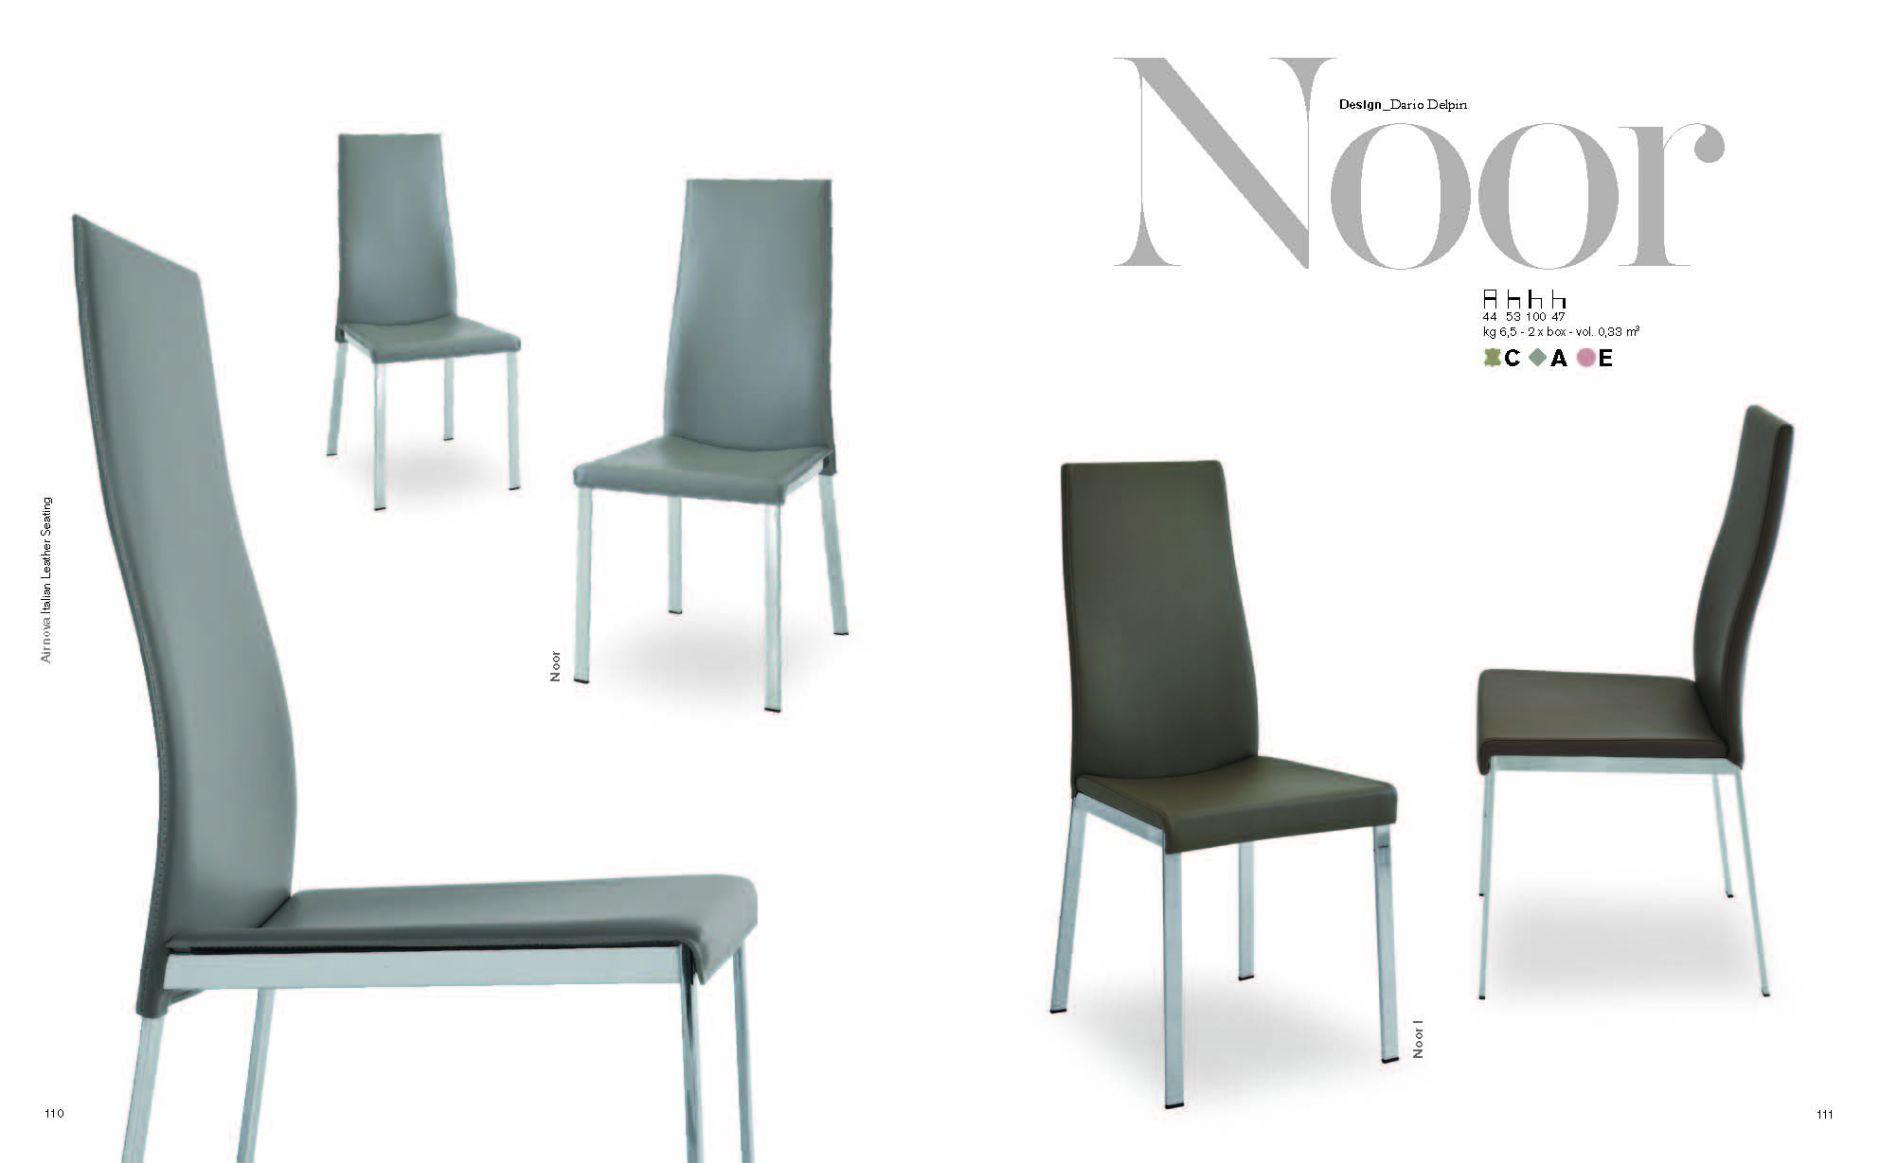 Großzügig Esszimmer Stuhle Mobel Design Italien Ideen ...